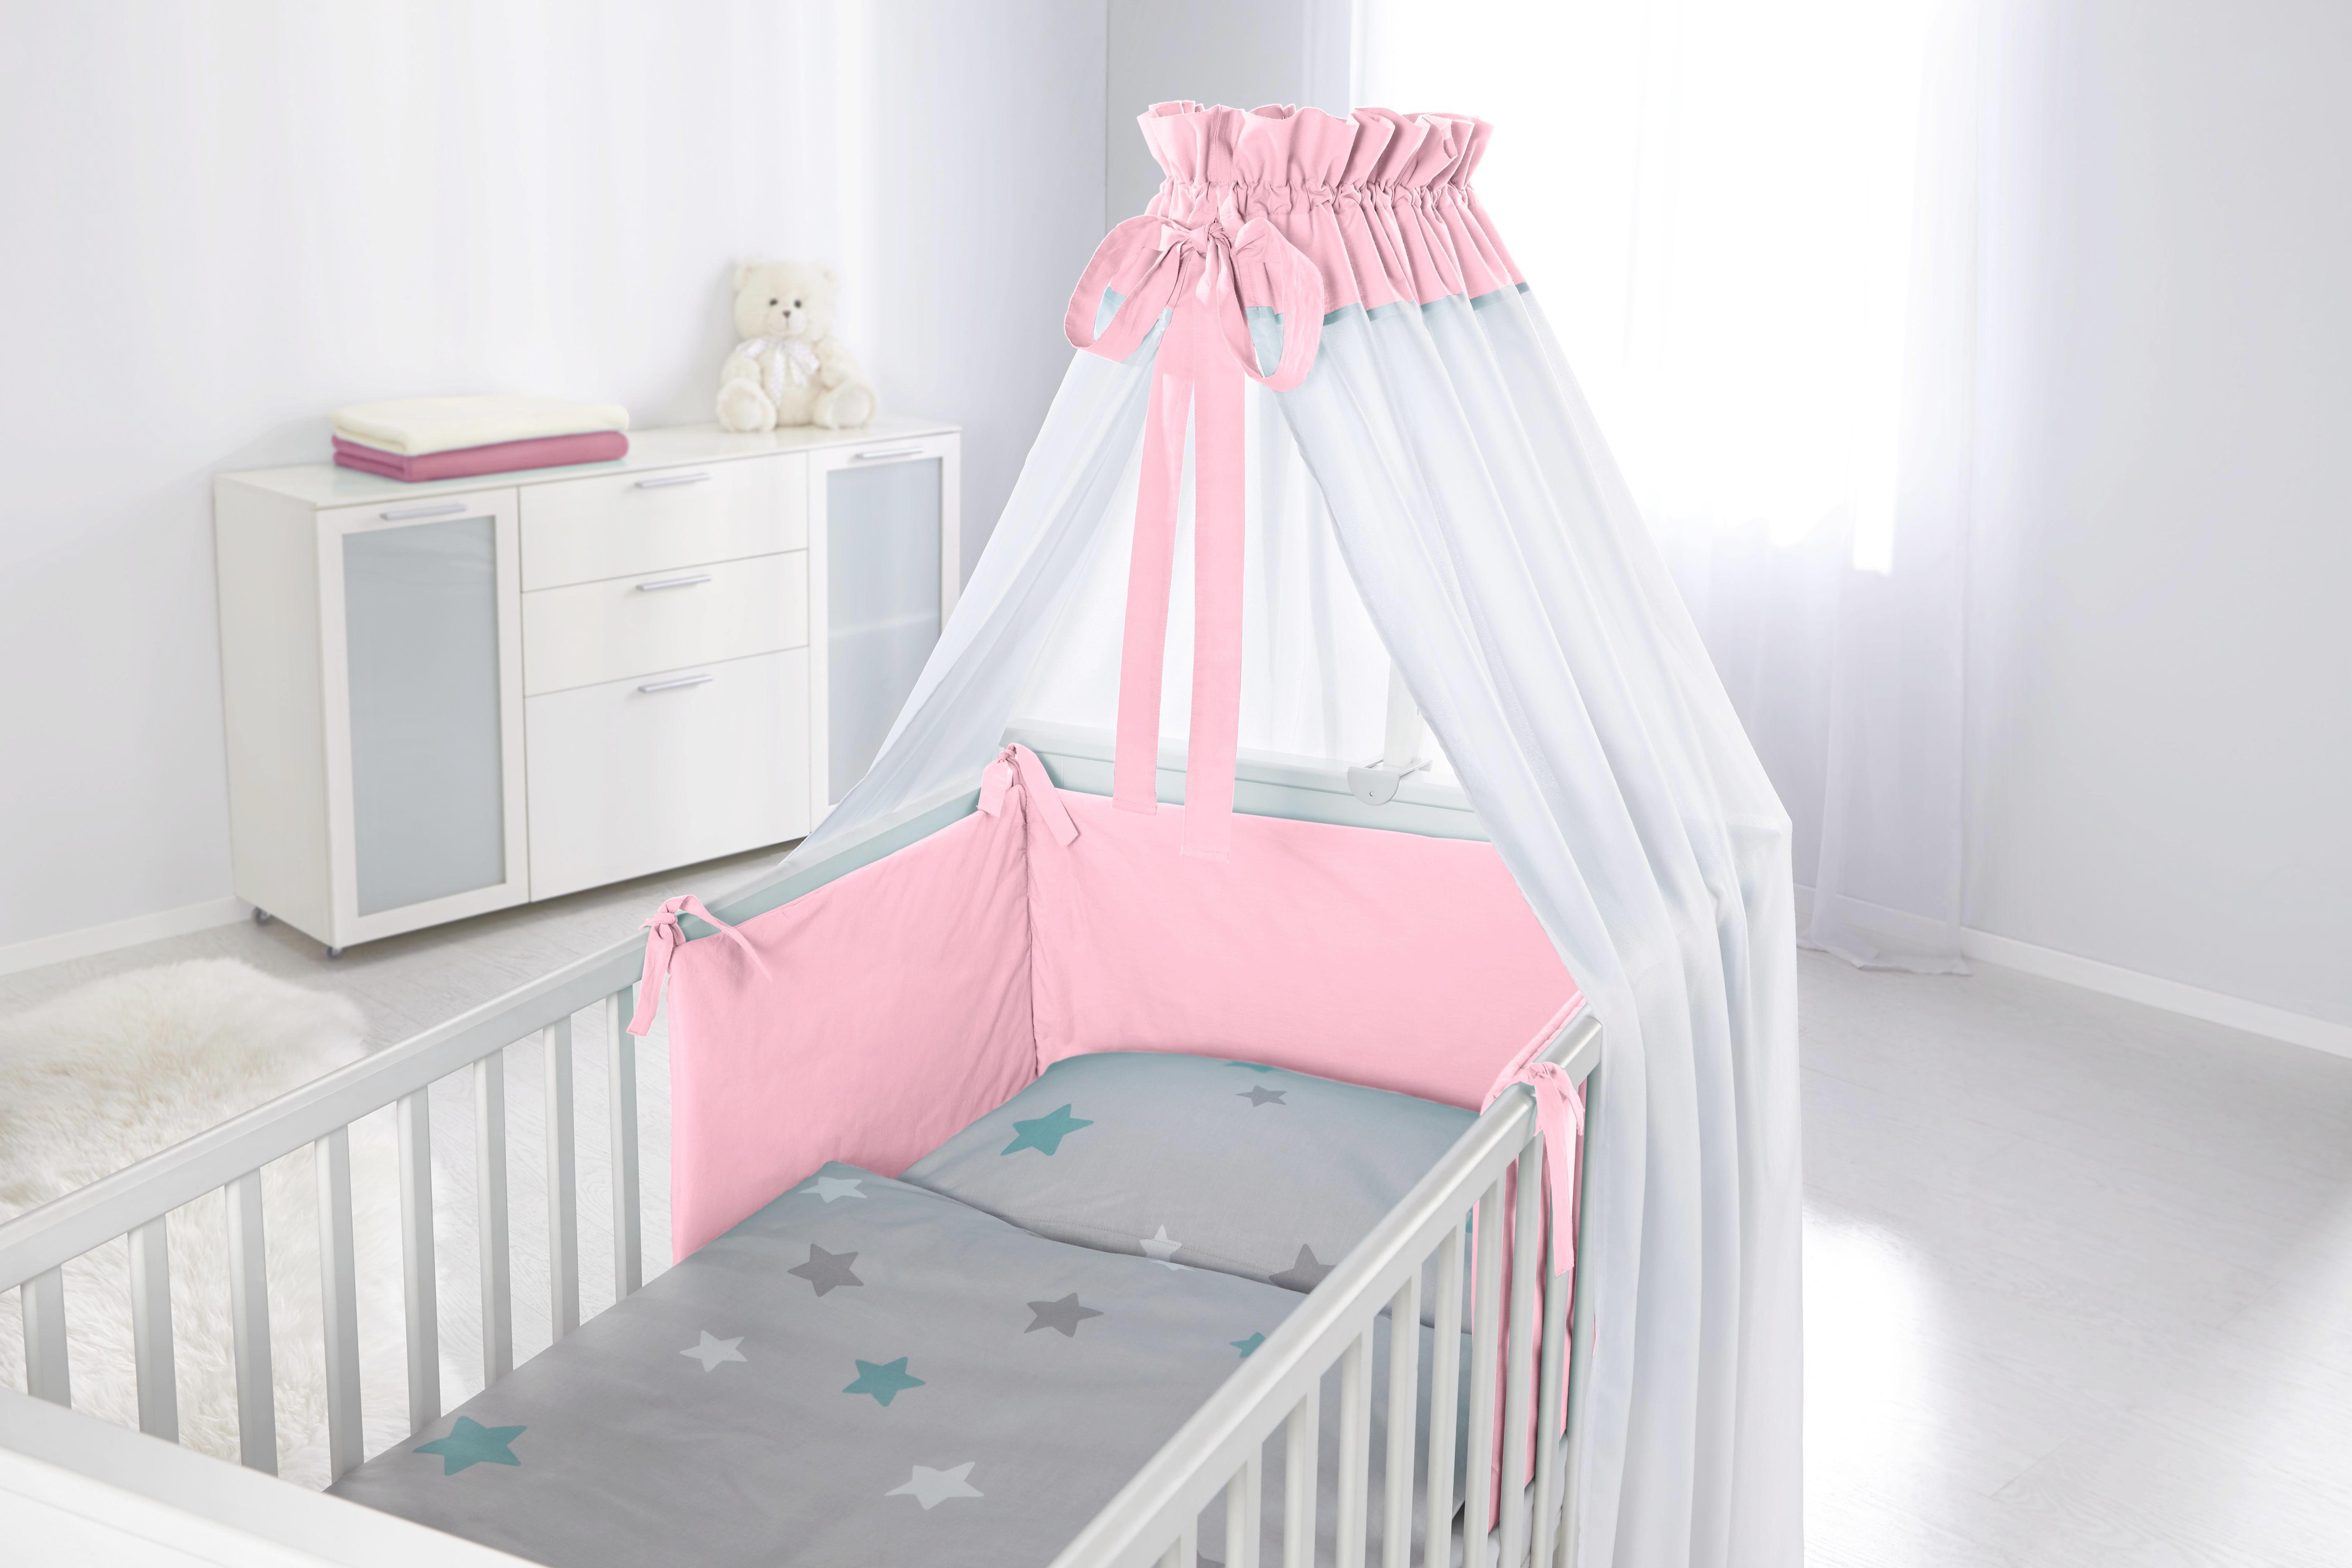 Nestchen in Grau/rosa - Rosa, Textil - MÖMAX modern living